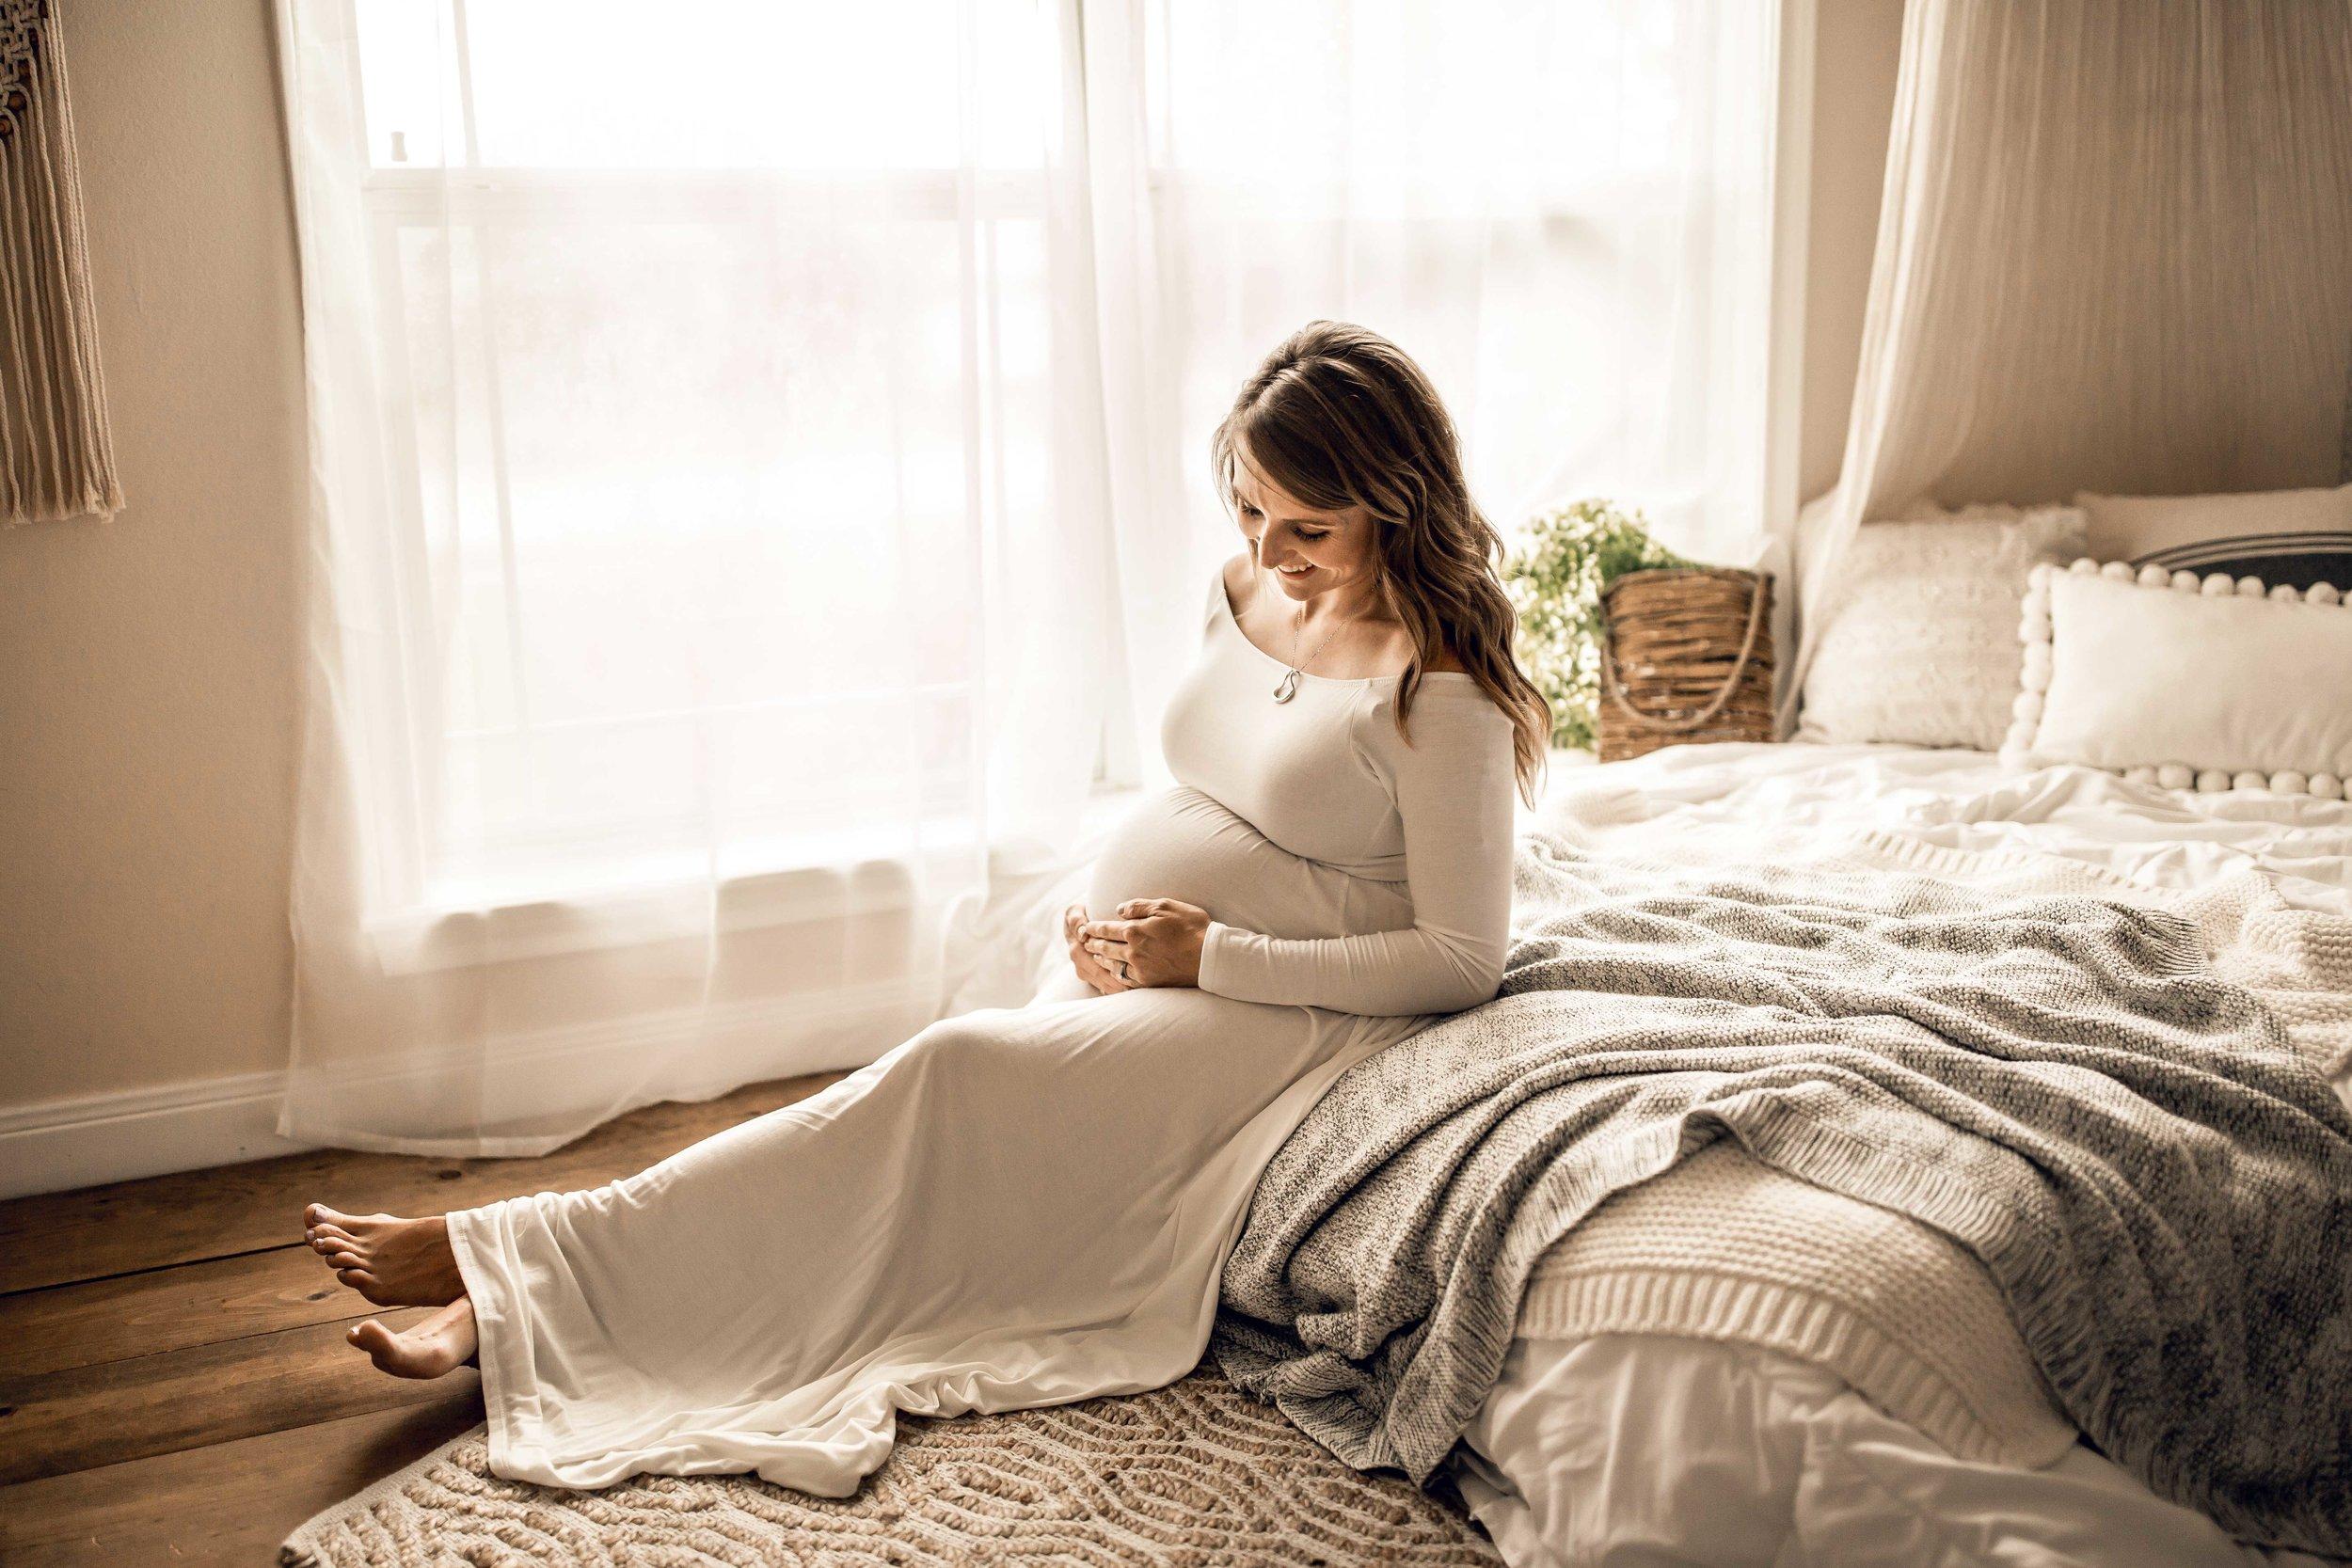 shelby-schiller-photography-maternity-white-flowy-dress-cream-gray-wood.jpg